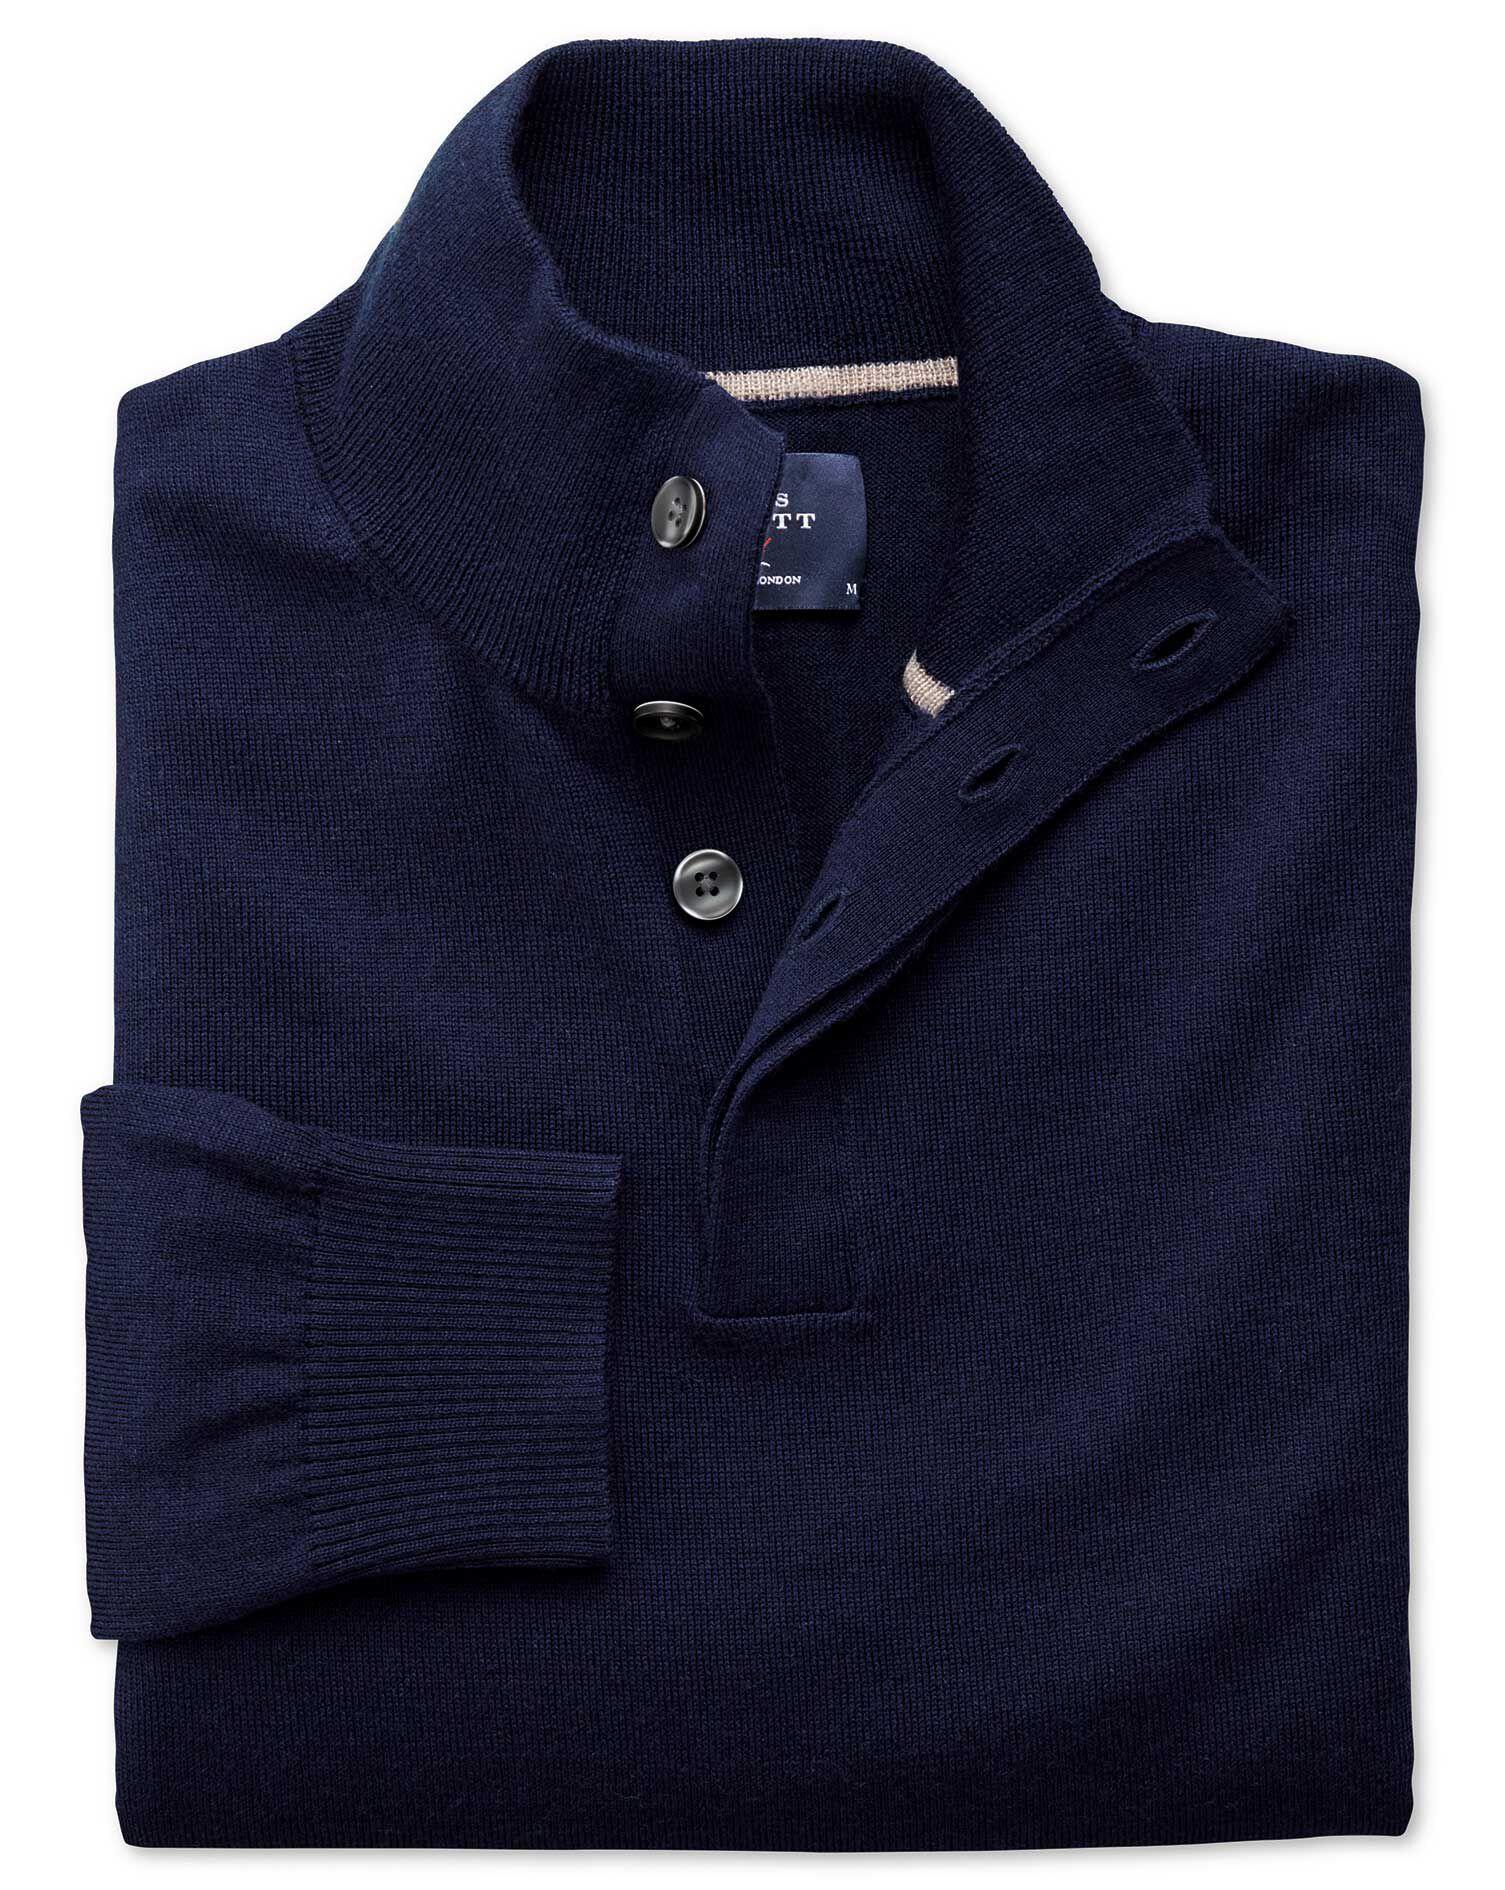 Navy Merino Wool Button Neck Jumper Size Large by Charles Tyrwhitt